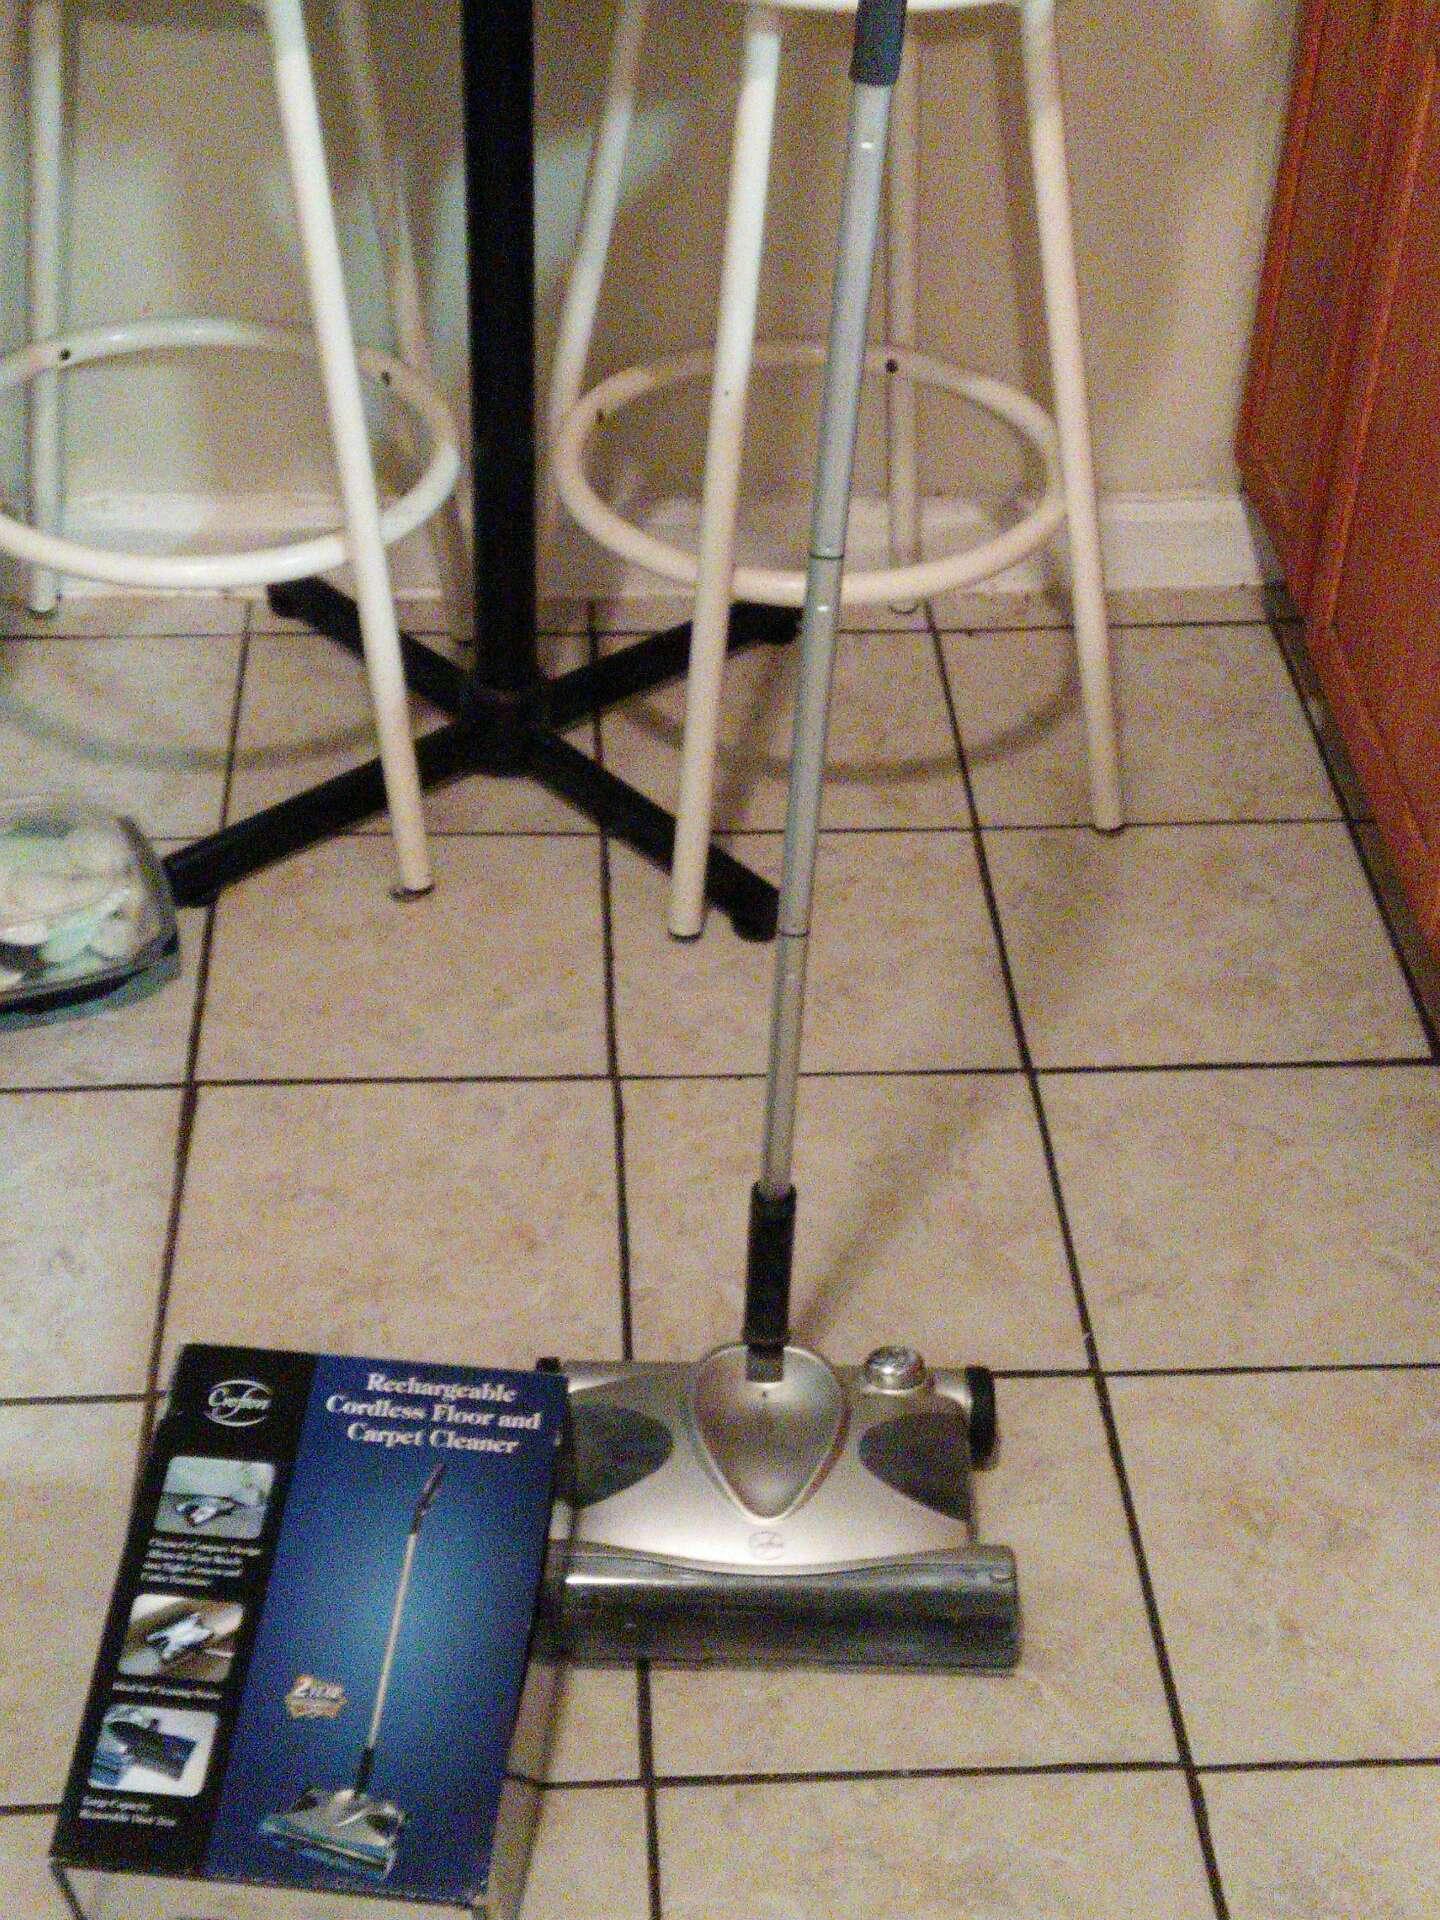 Crofton Carpet Cleaner Manual Crofton Carpet Cleaner Aldi